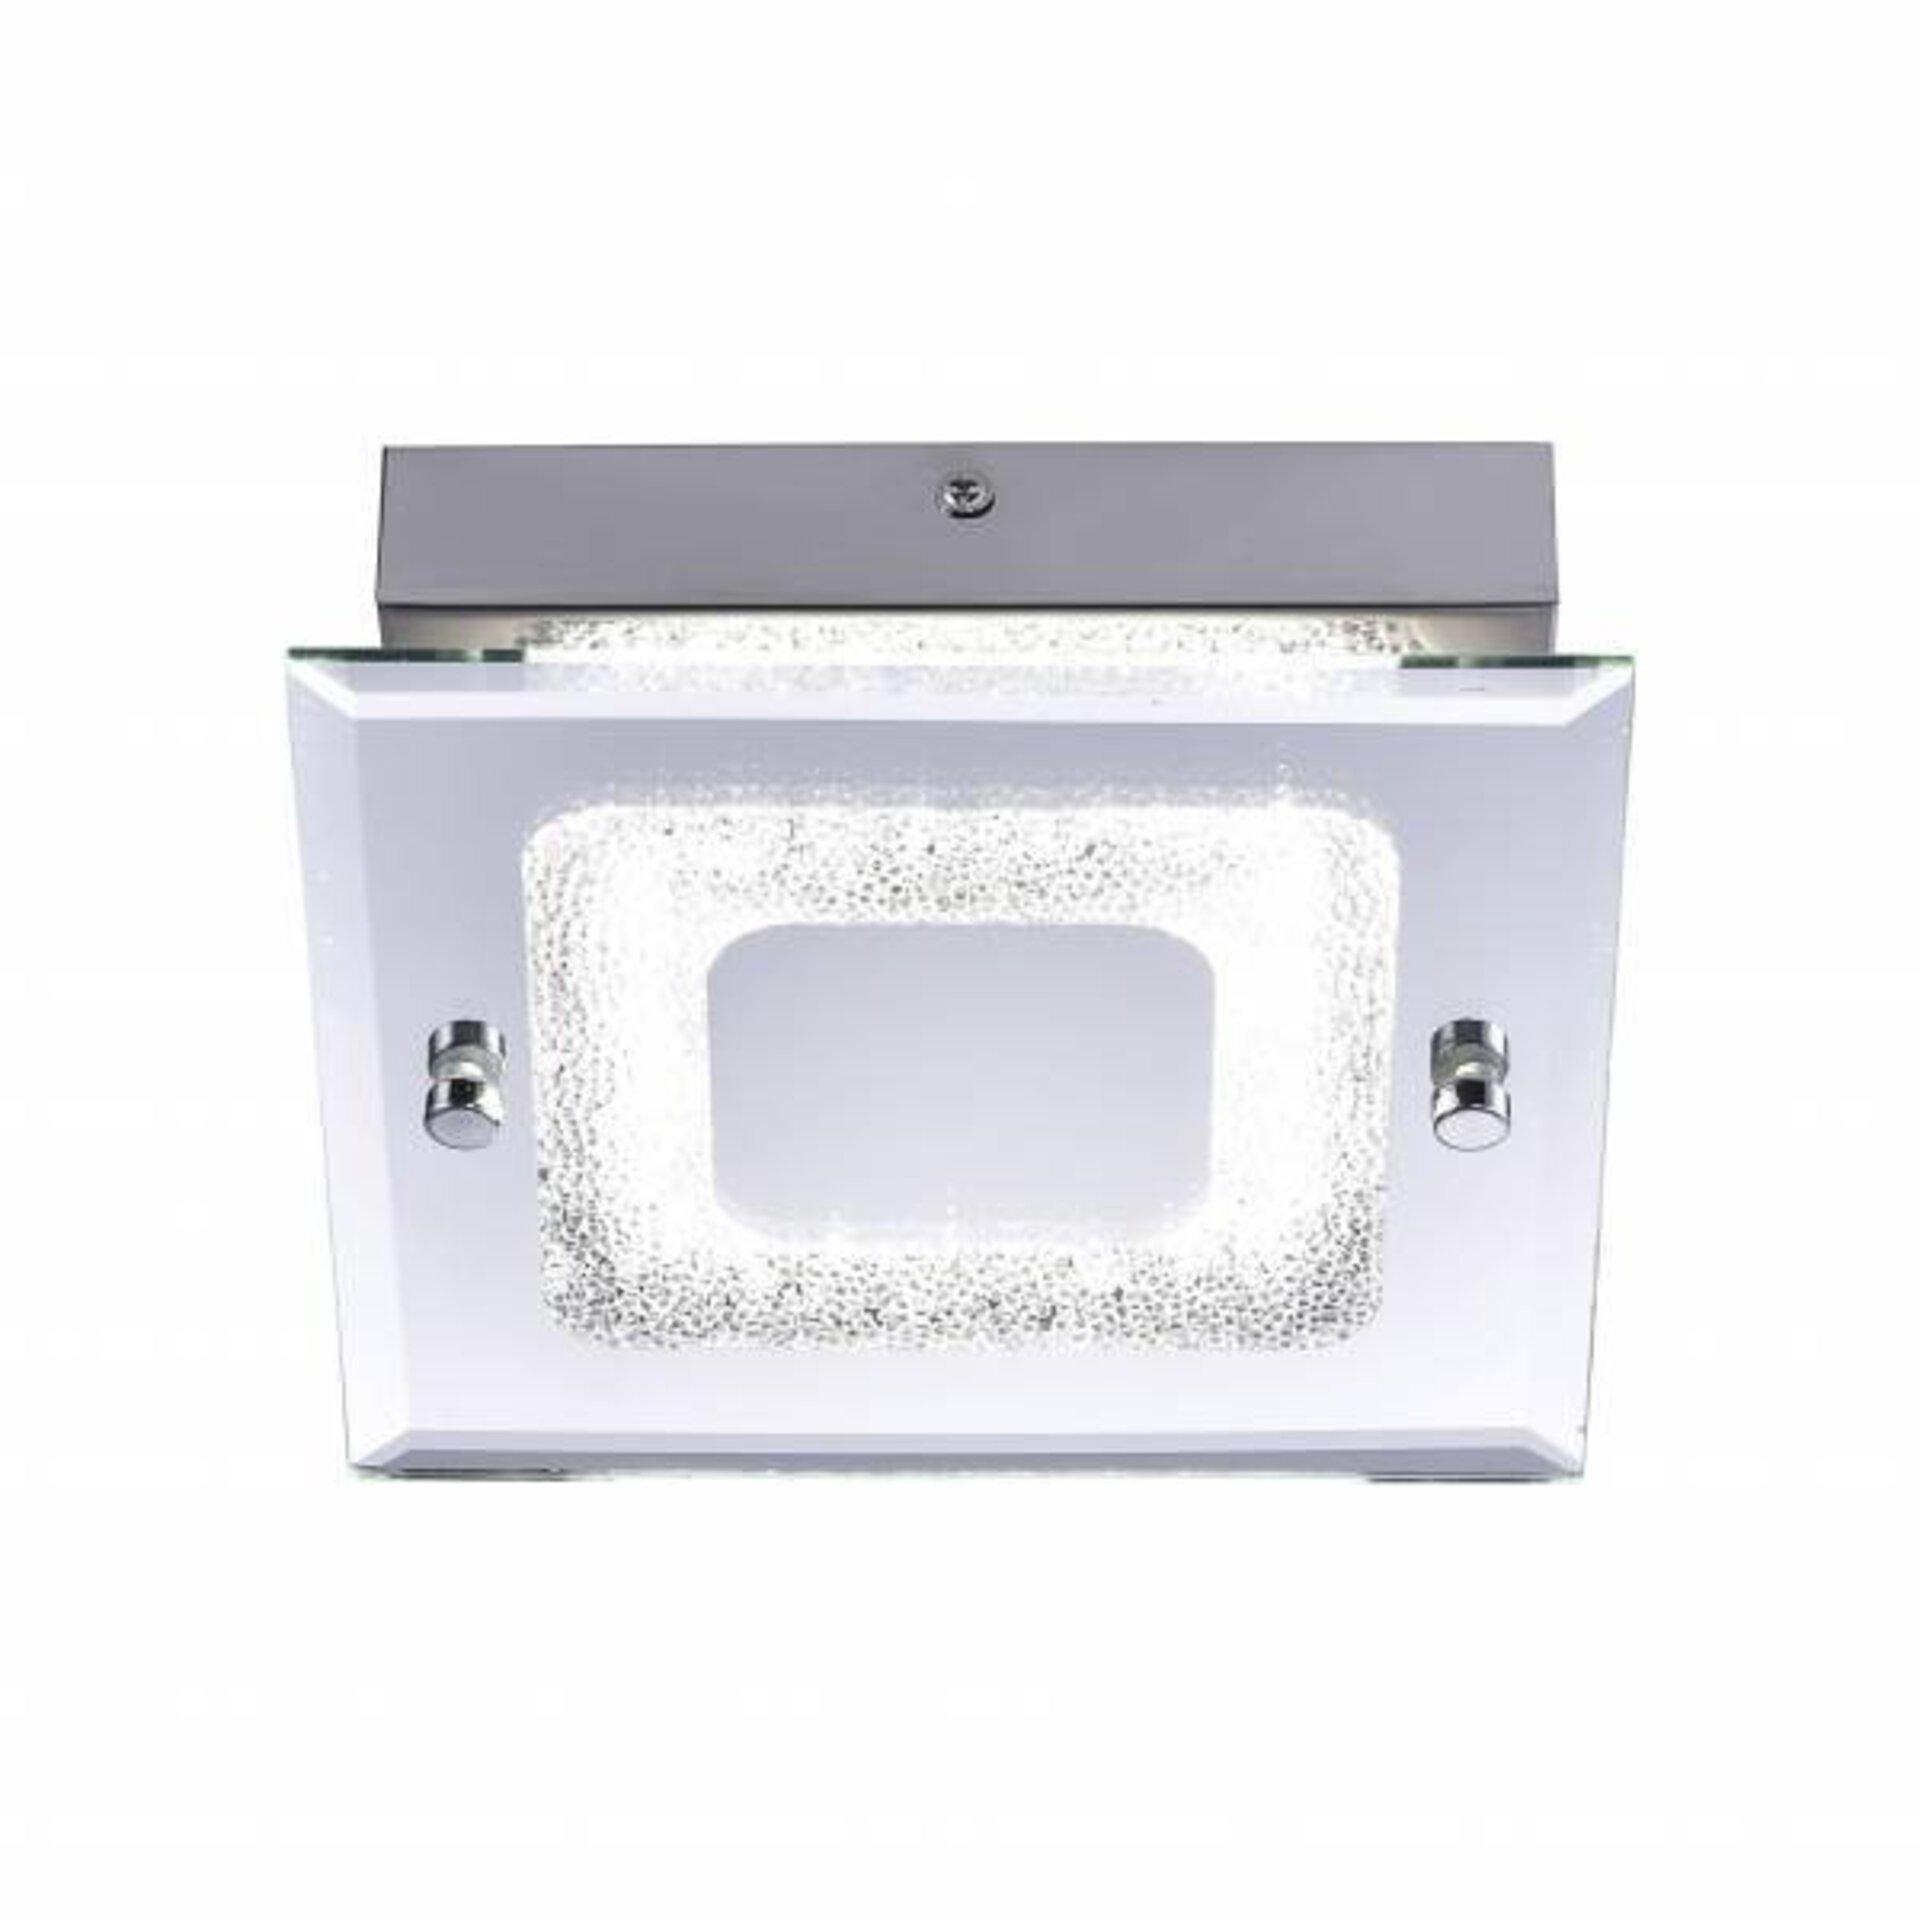 Deckenleuchte LISA Leuchtendirekt Metall silber 18 x 6 x 18 cm